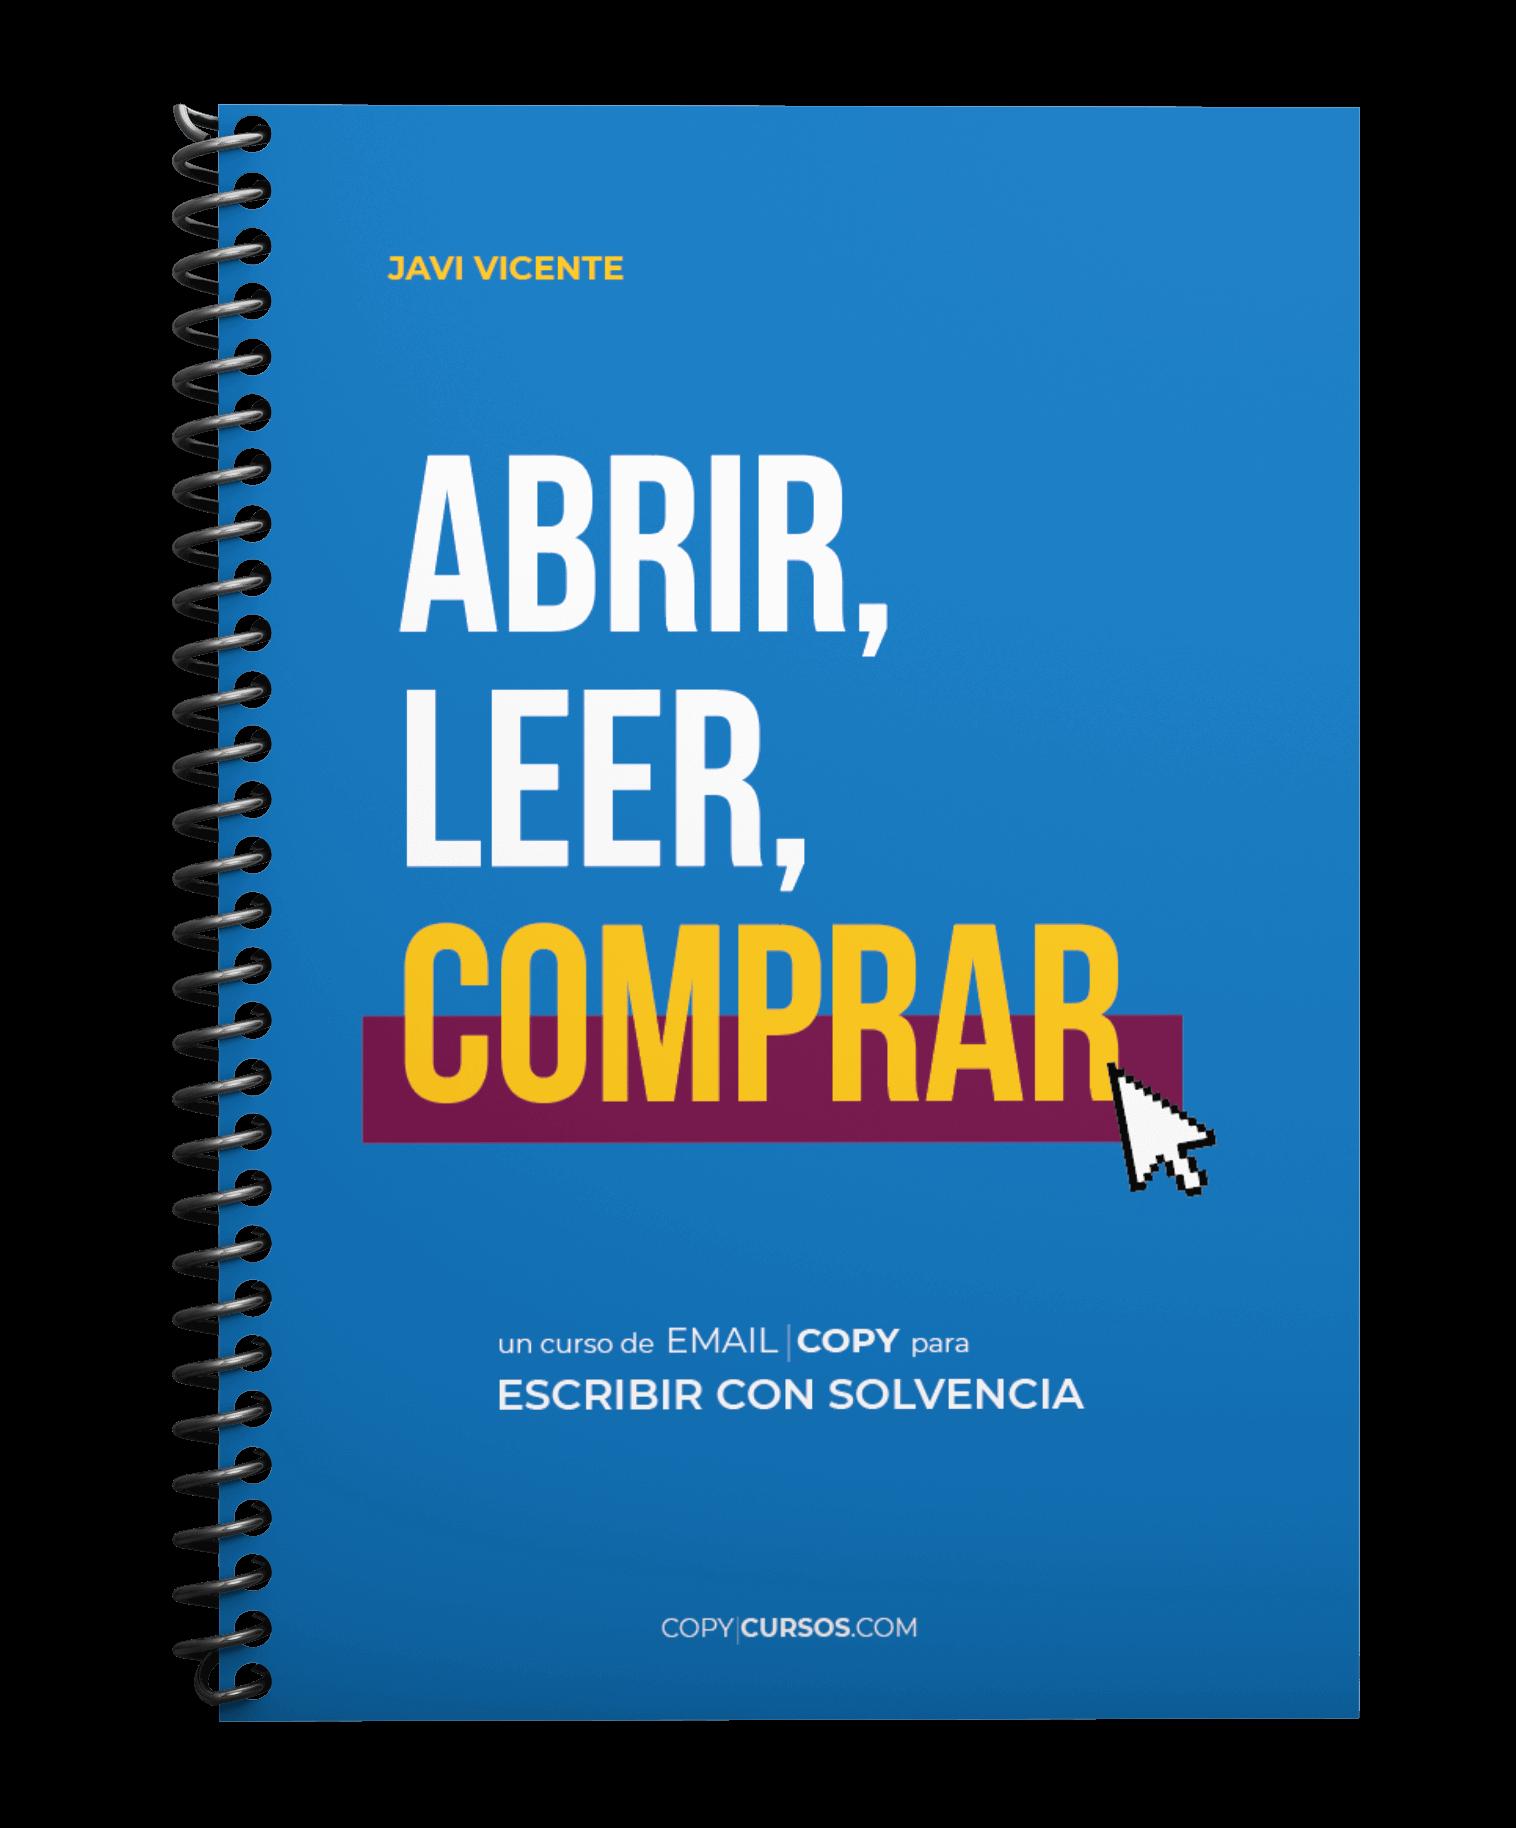 Formación ABRIR, LEER, COMPRAR. Email Copywriting